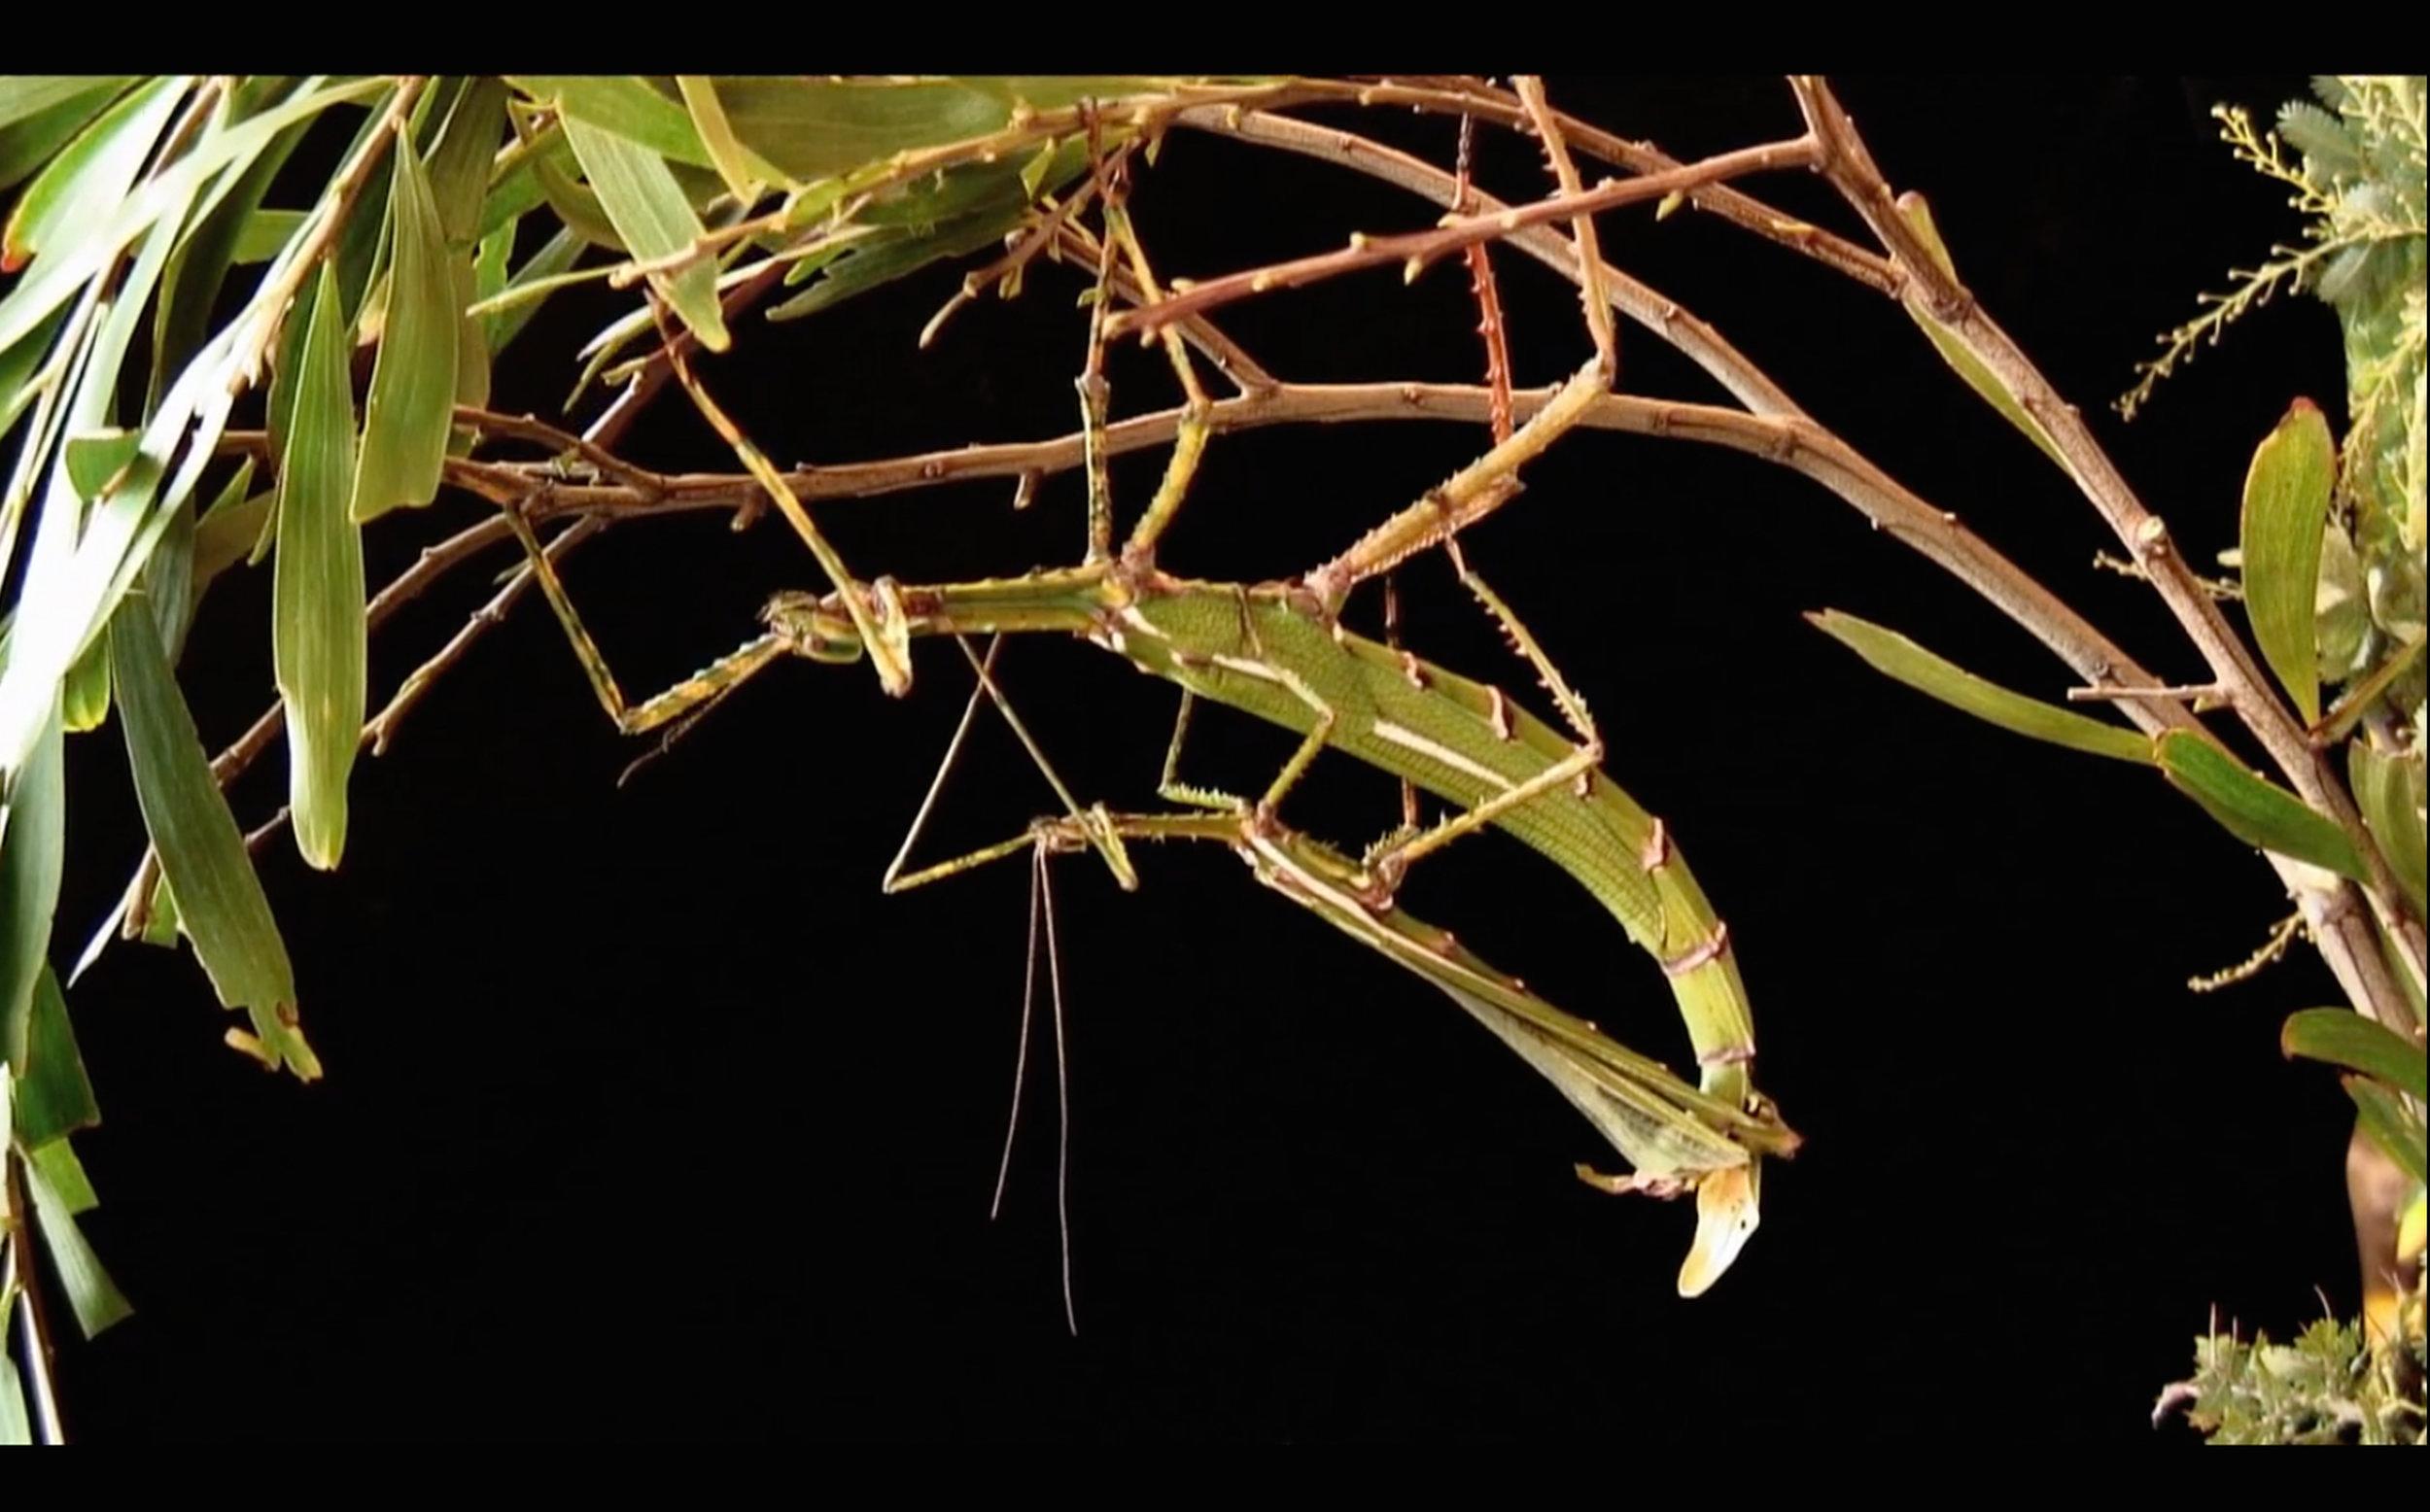 Maria Fernanda Cardoso,  Stick Insect's Most Intimate Moments , 2008-2011, single channel HD video, colour, 37min.